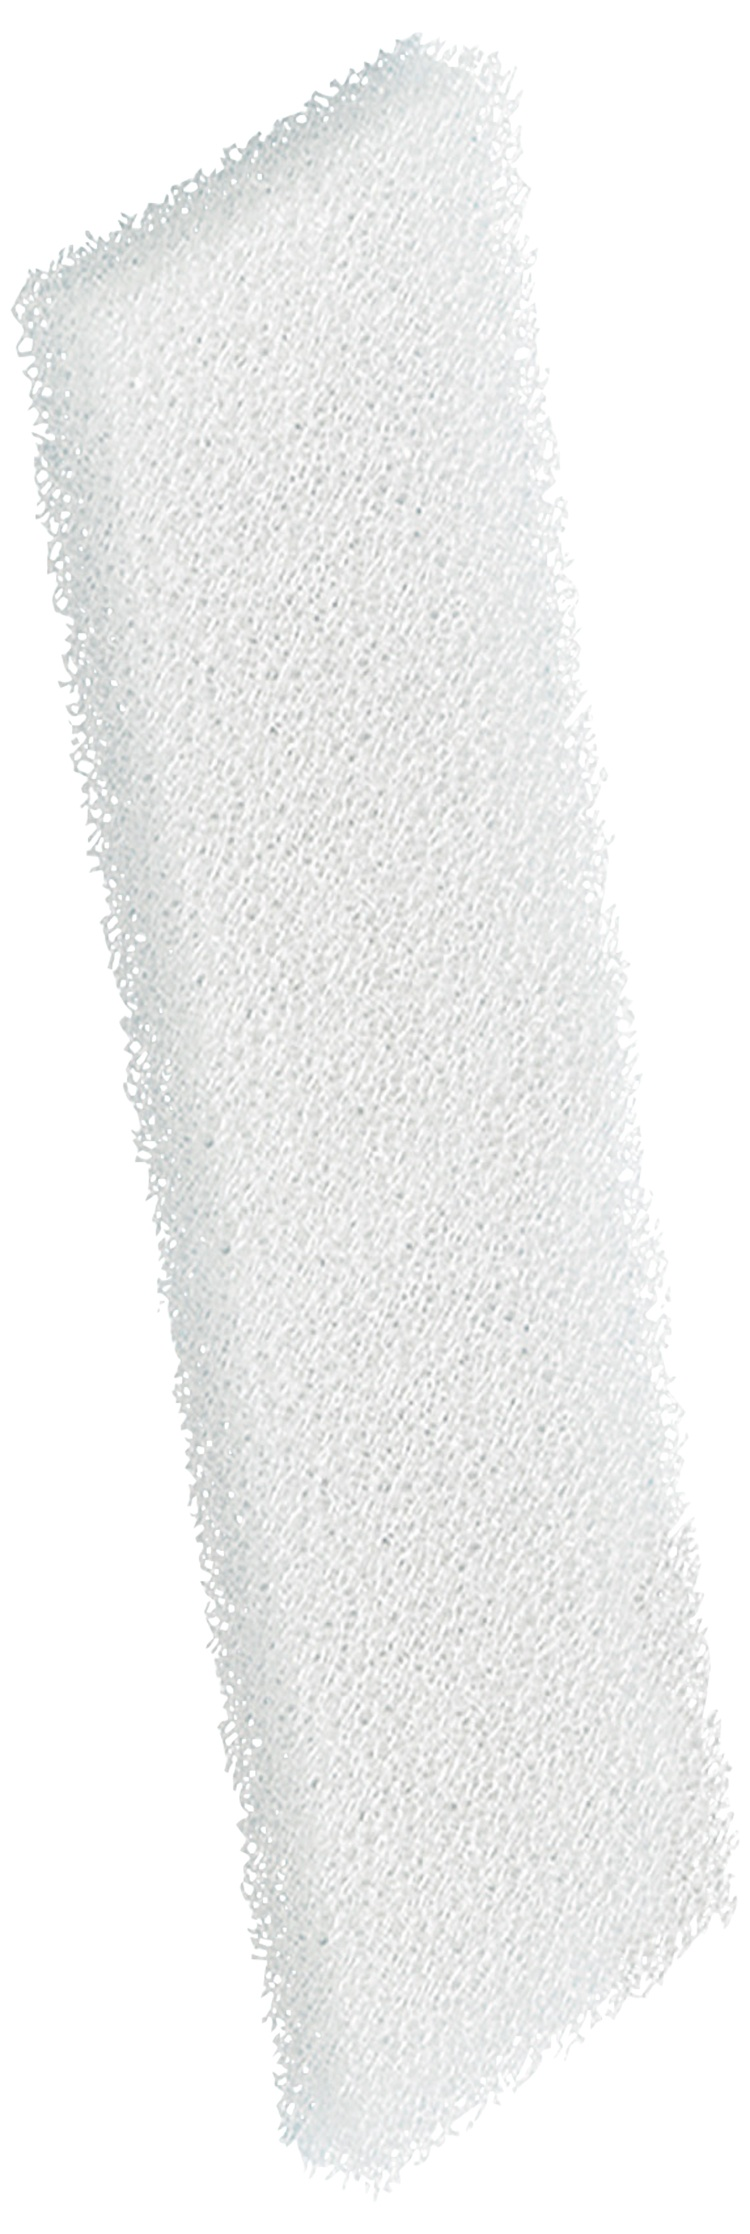 Akvārija filtru pildījums - Foam for Fluval U4